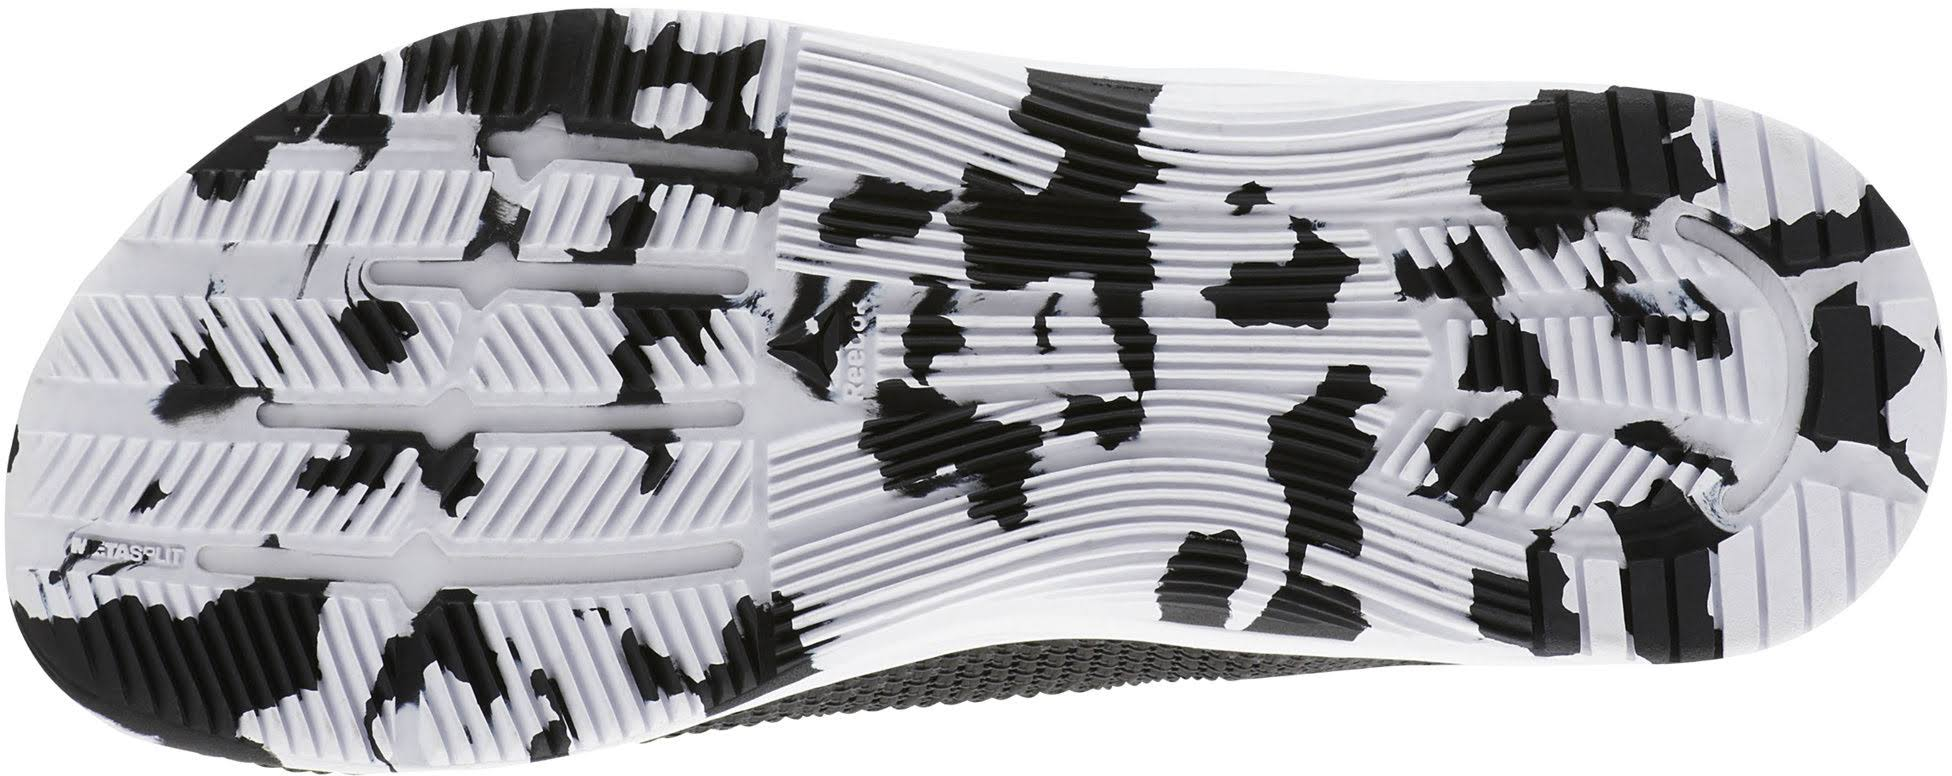 5 8 Crossfit Shoes Flexweave Blanco Reebok 8 Cn2977 Nano 5tA0dnq